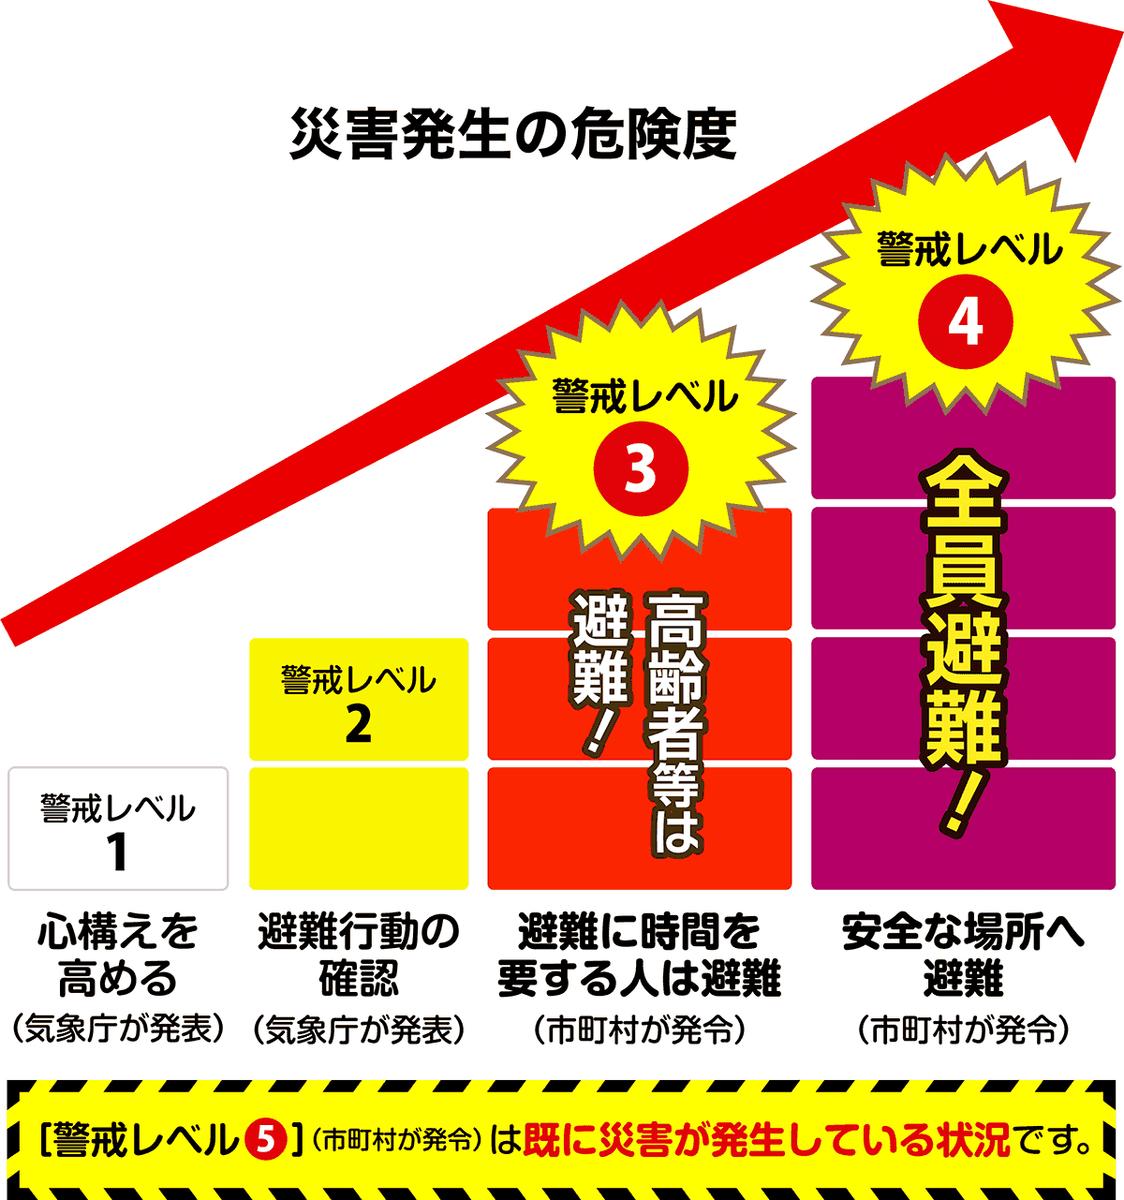 f:id:gyuuhomura:20200415140727p:plain